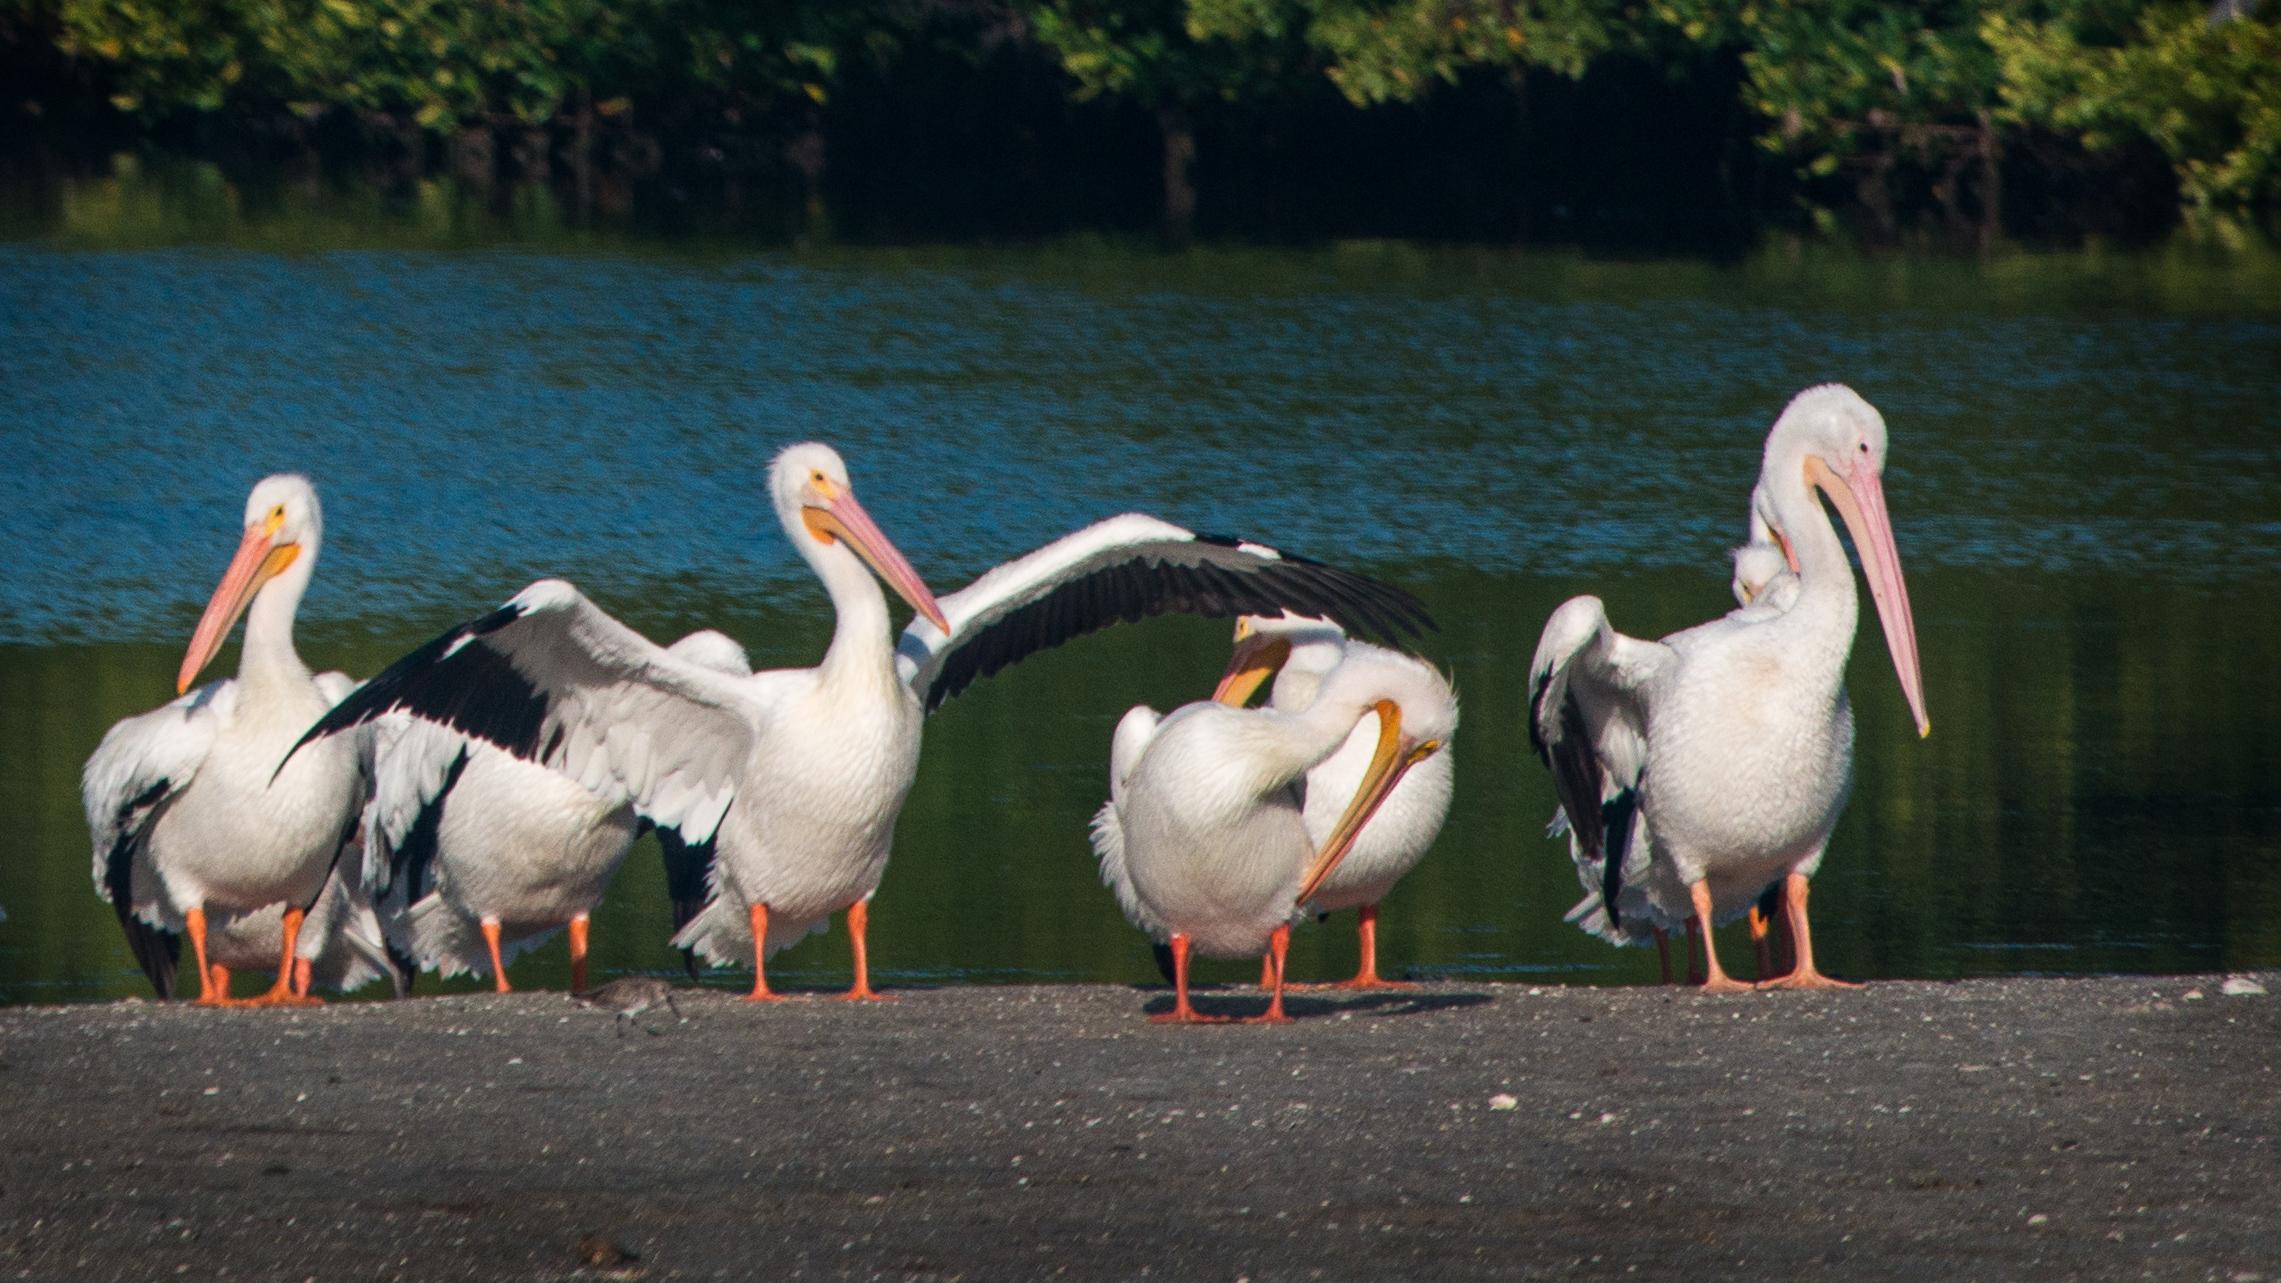 #whitepelican, #pelicans, #florida, #wildlife, #snowbird, #morning, #sun, #dingdarling, #wildlife, #refuge, #birds, #florida, #sanibel